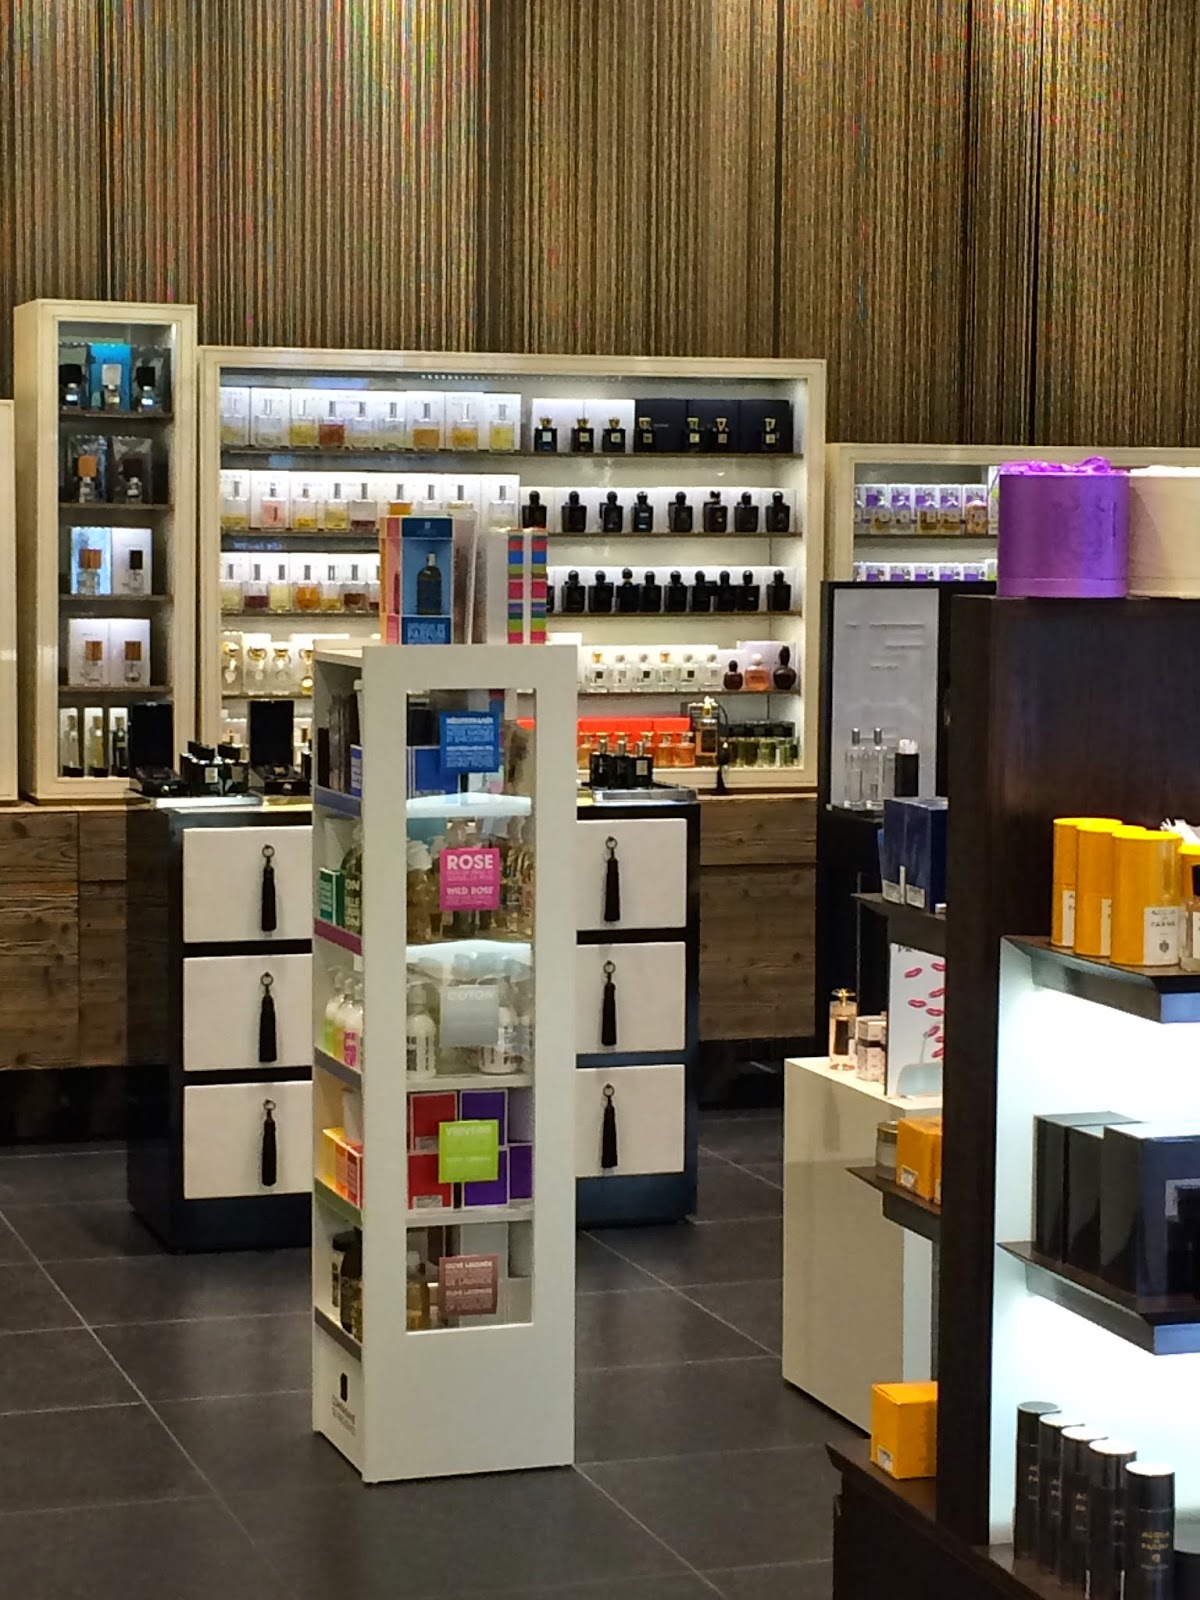 discounted perfumes